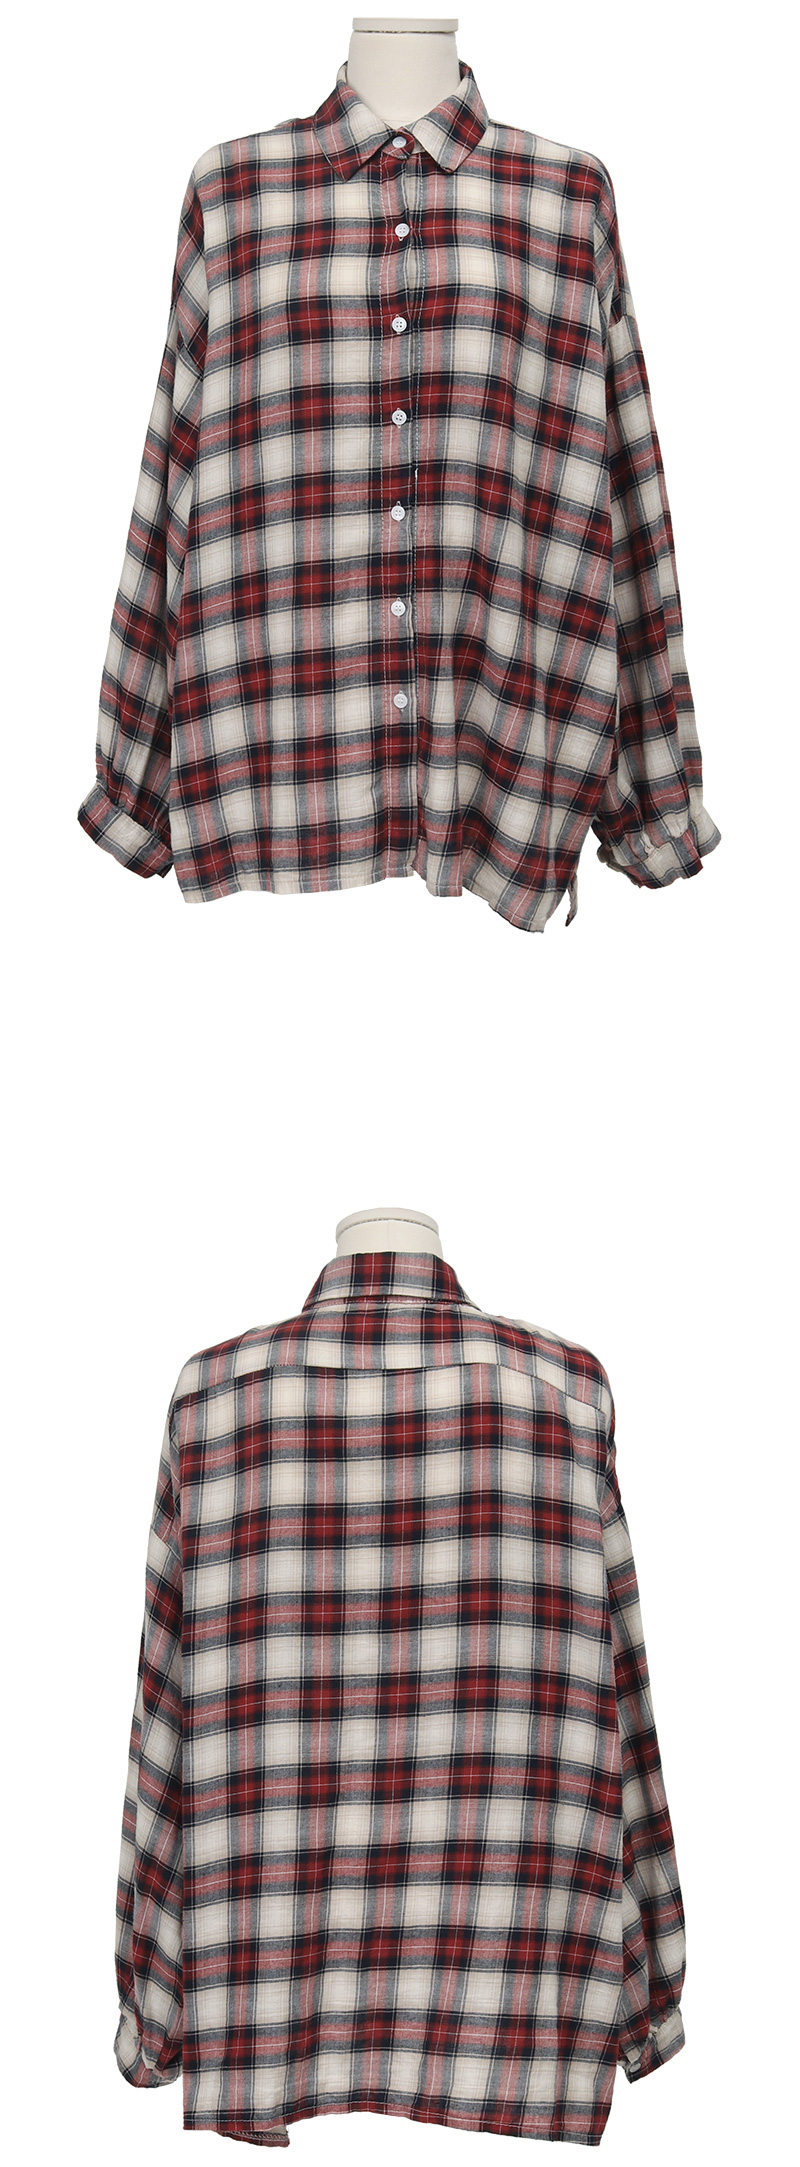 Alarm check shirts_C